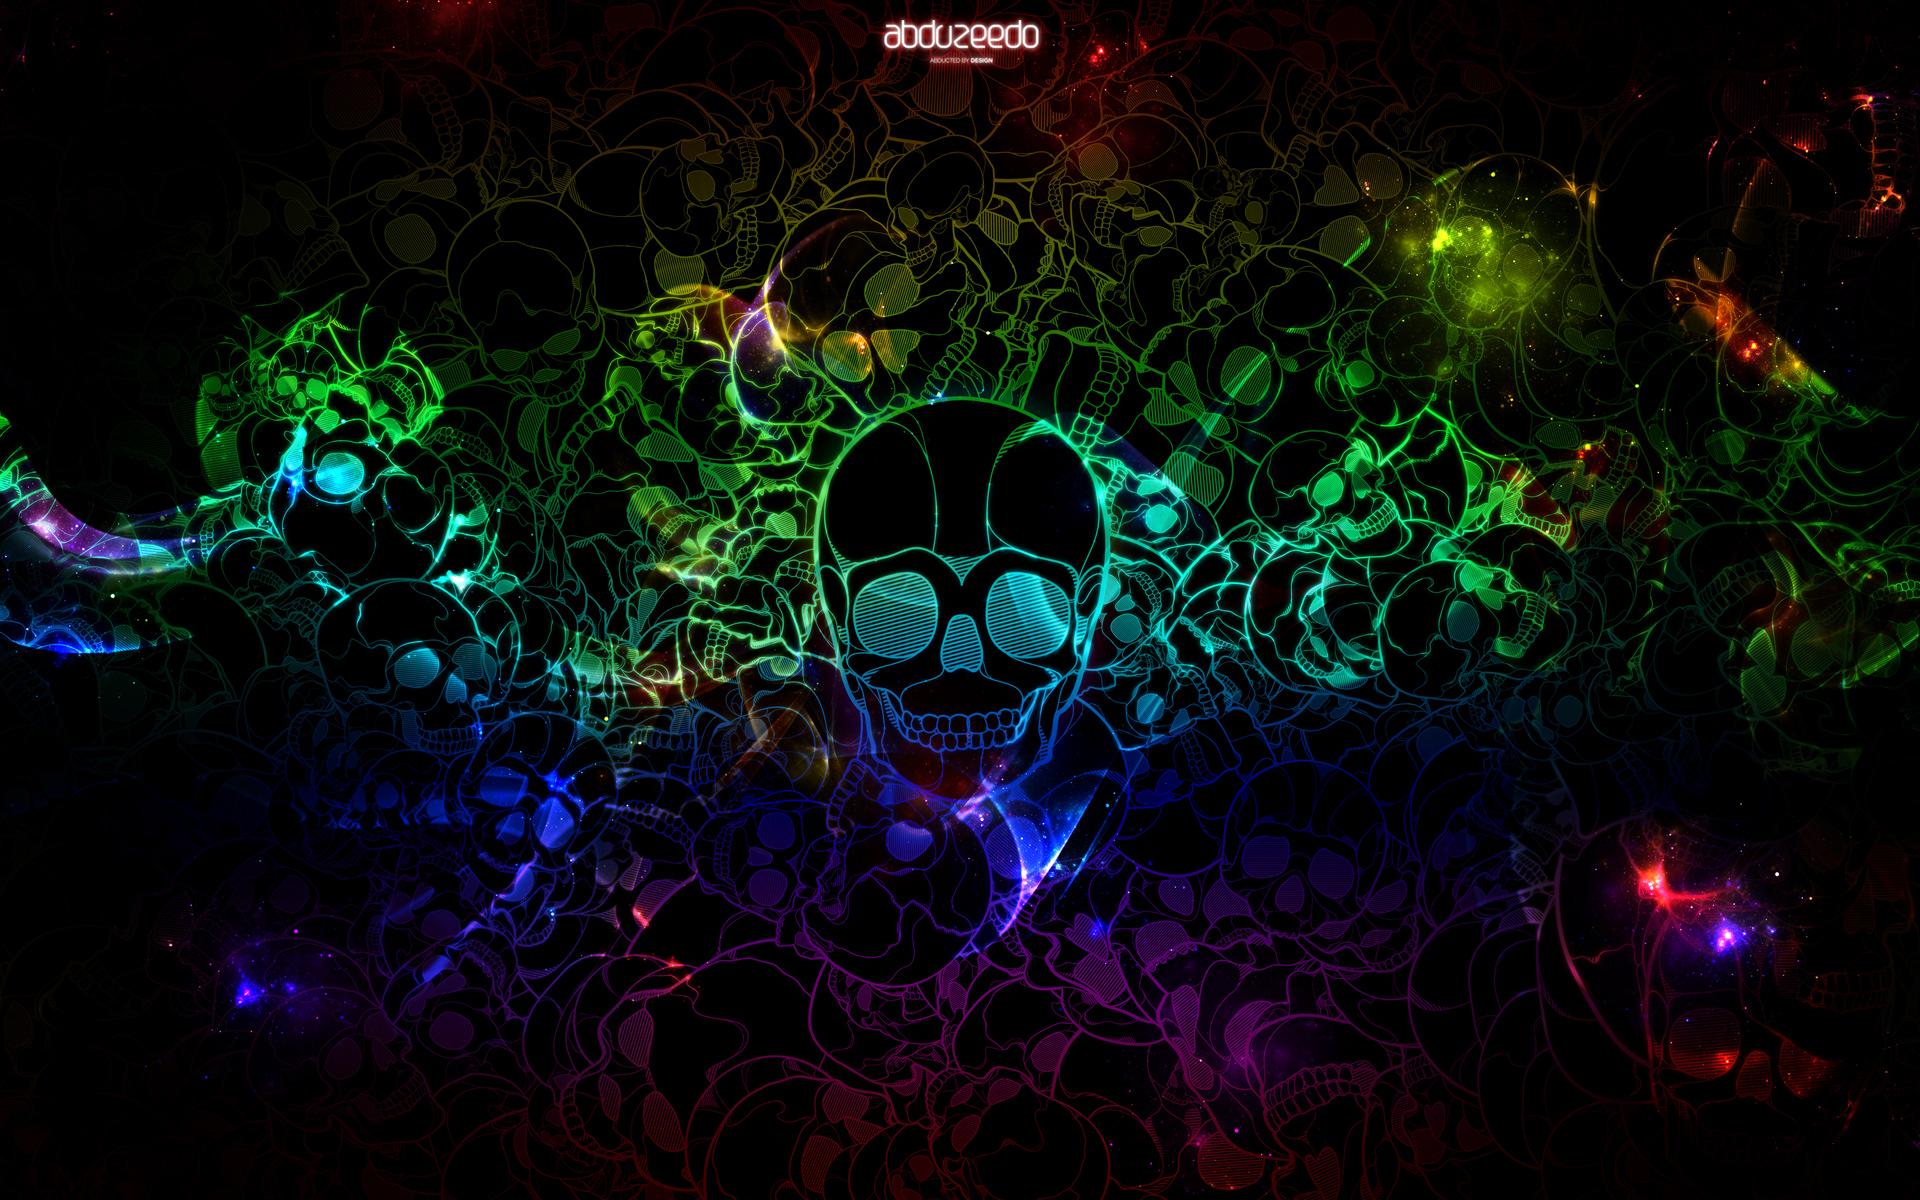 Incredible Neon Skull Wallpaper: Wallpaper Of The Week 20